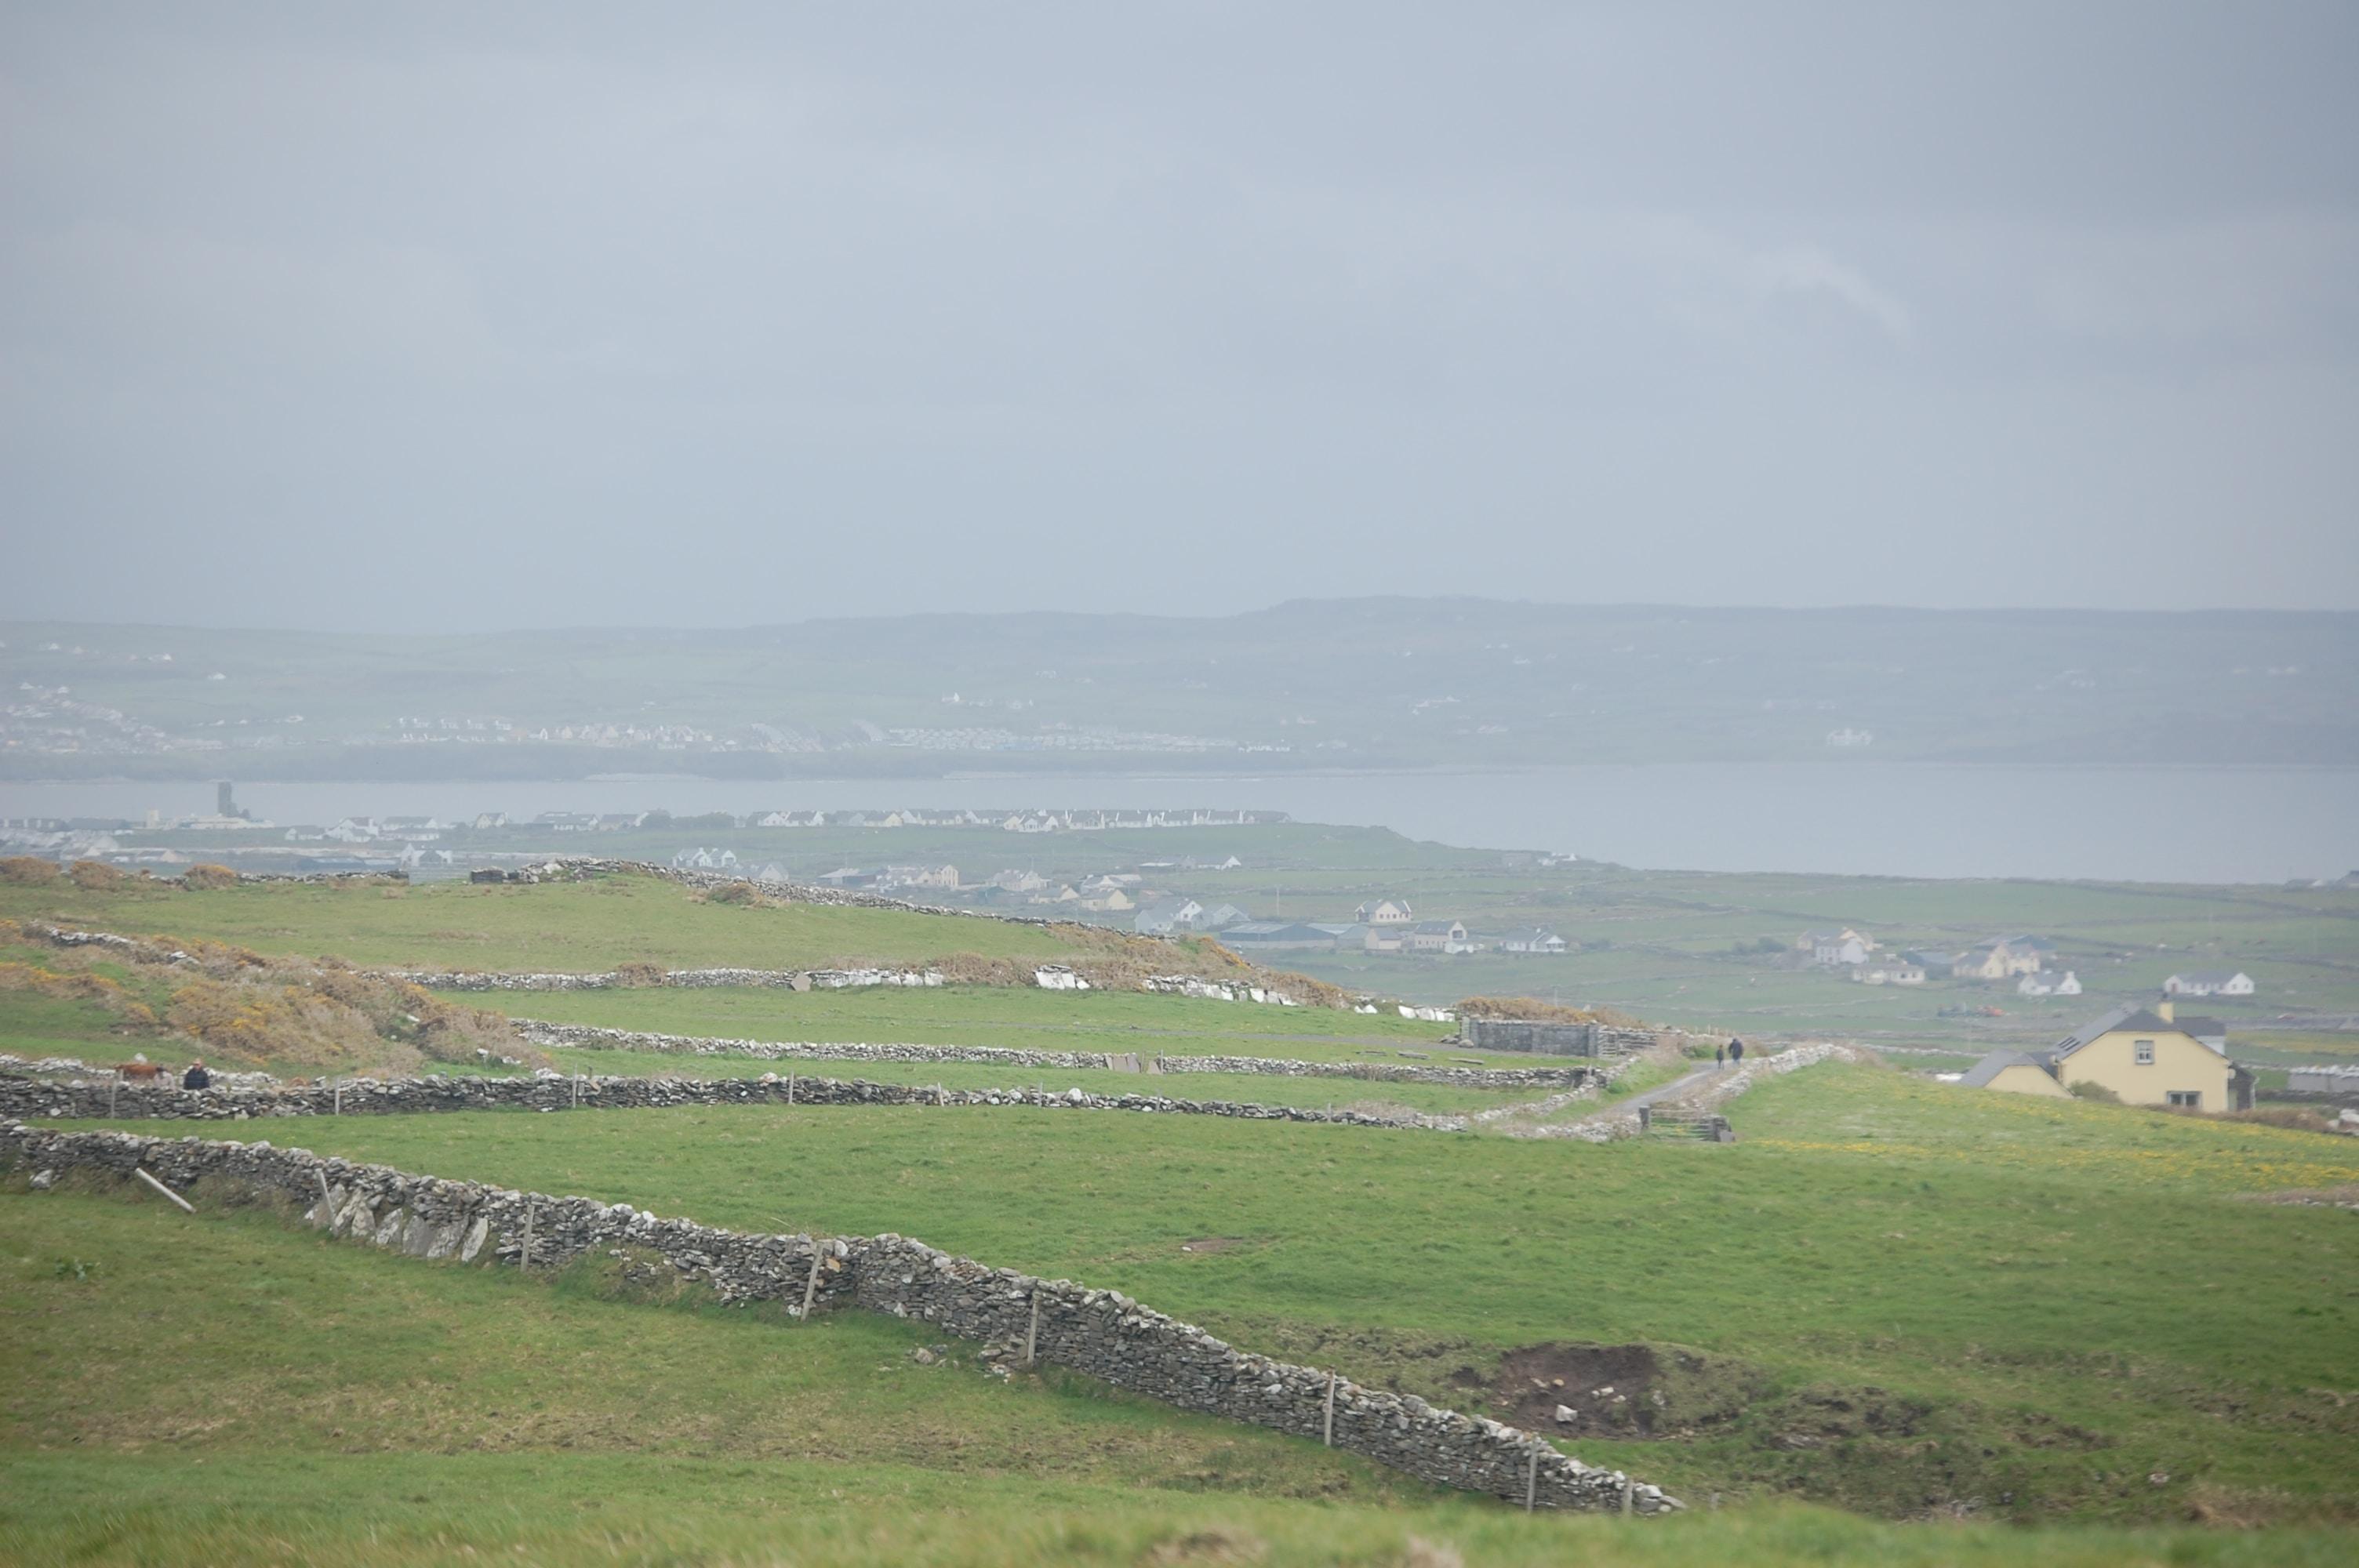 landscape photo of green grass field